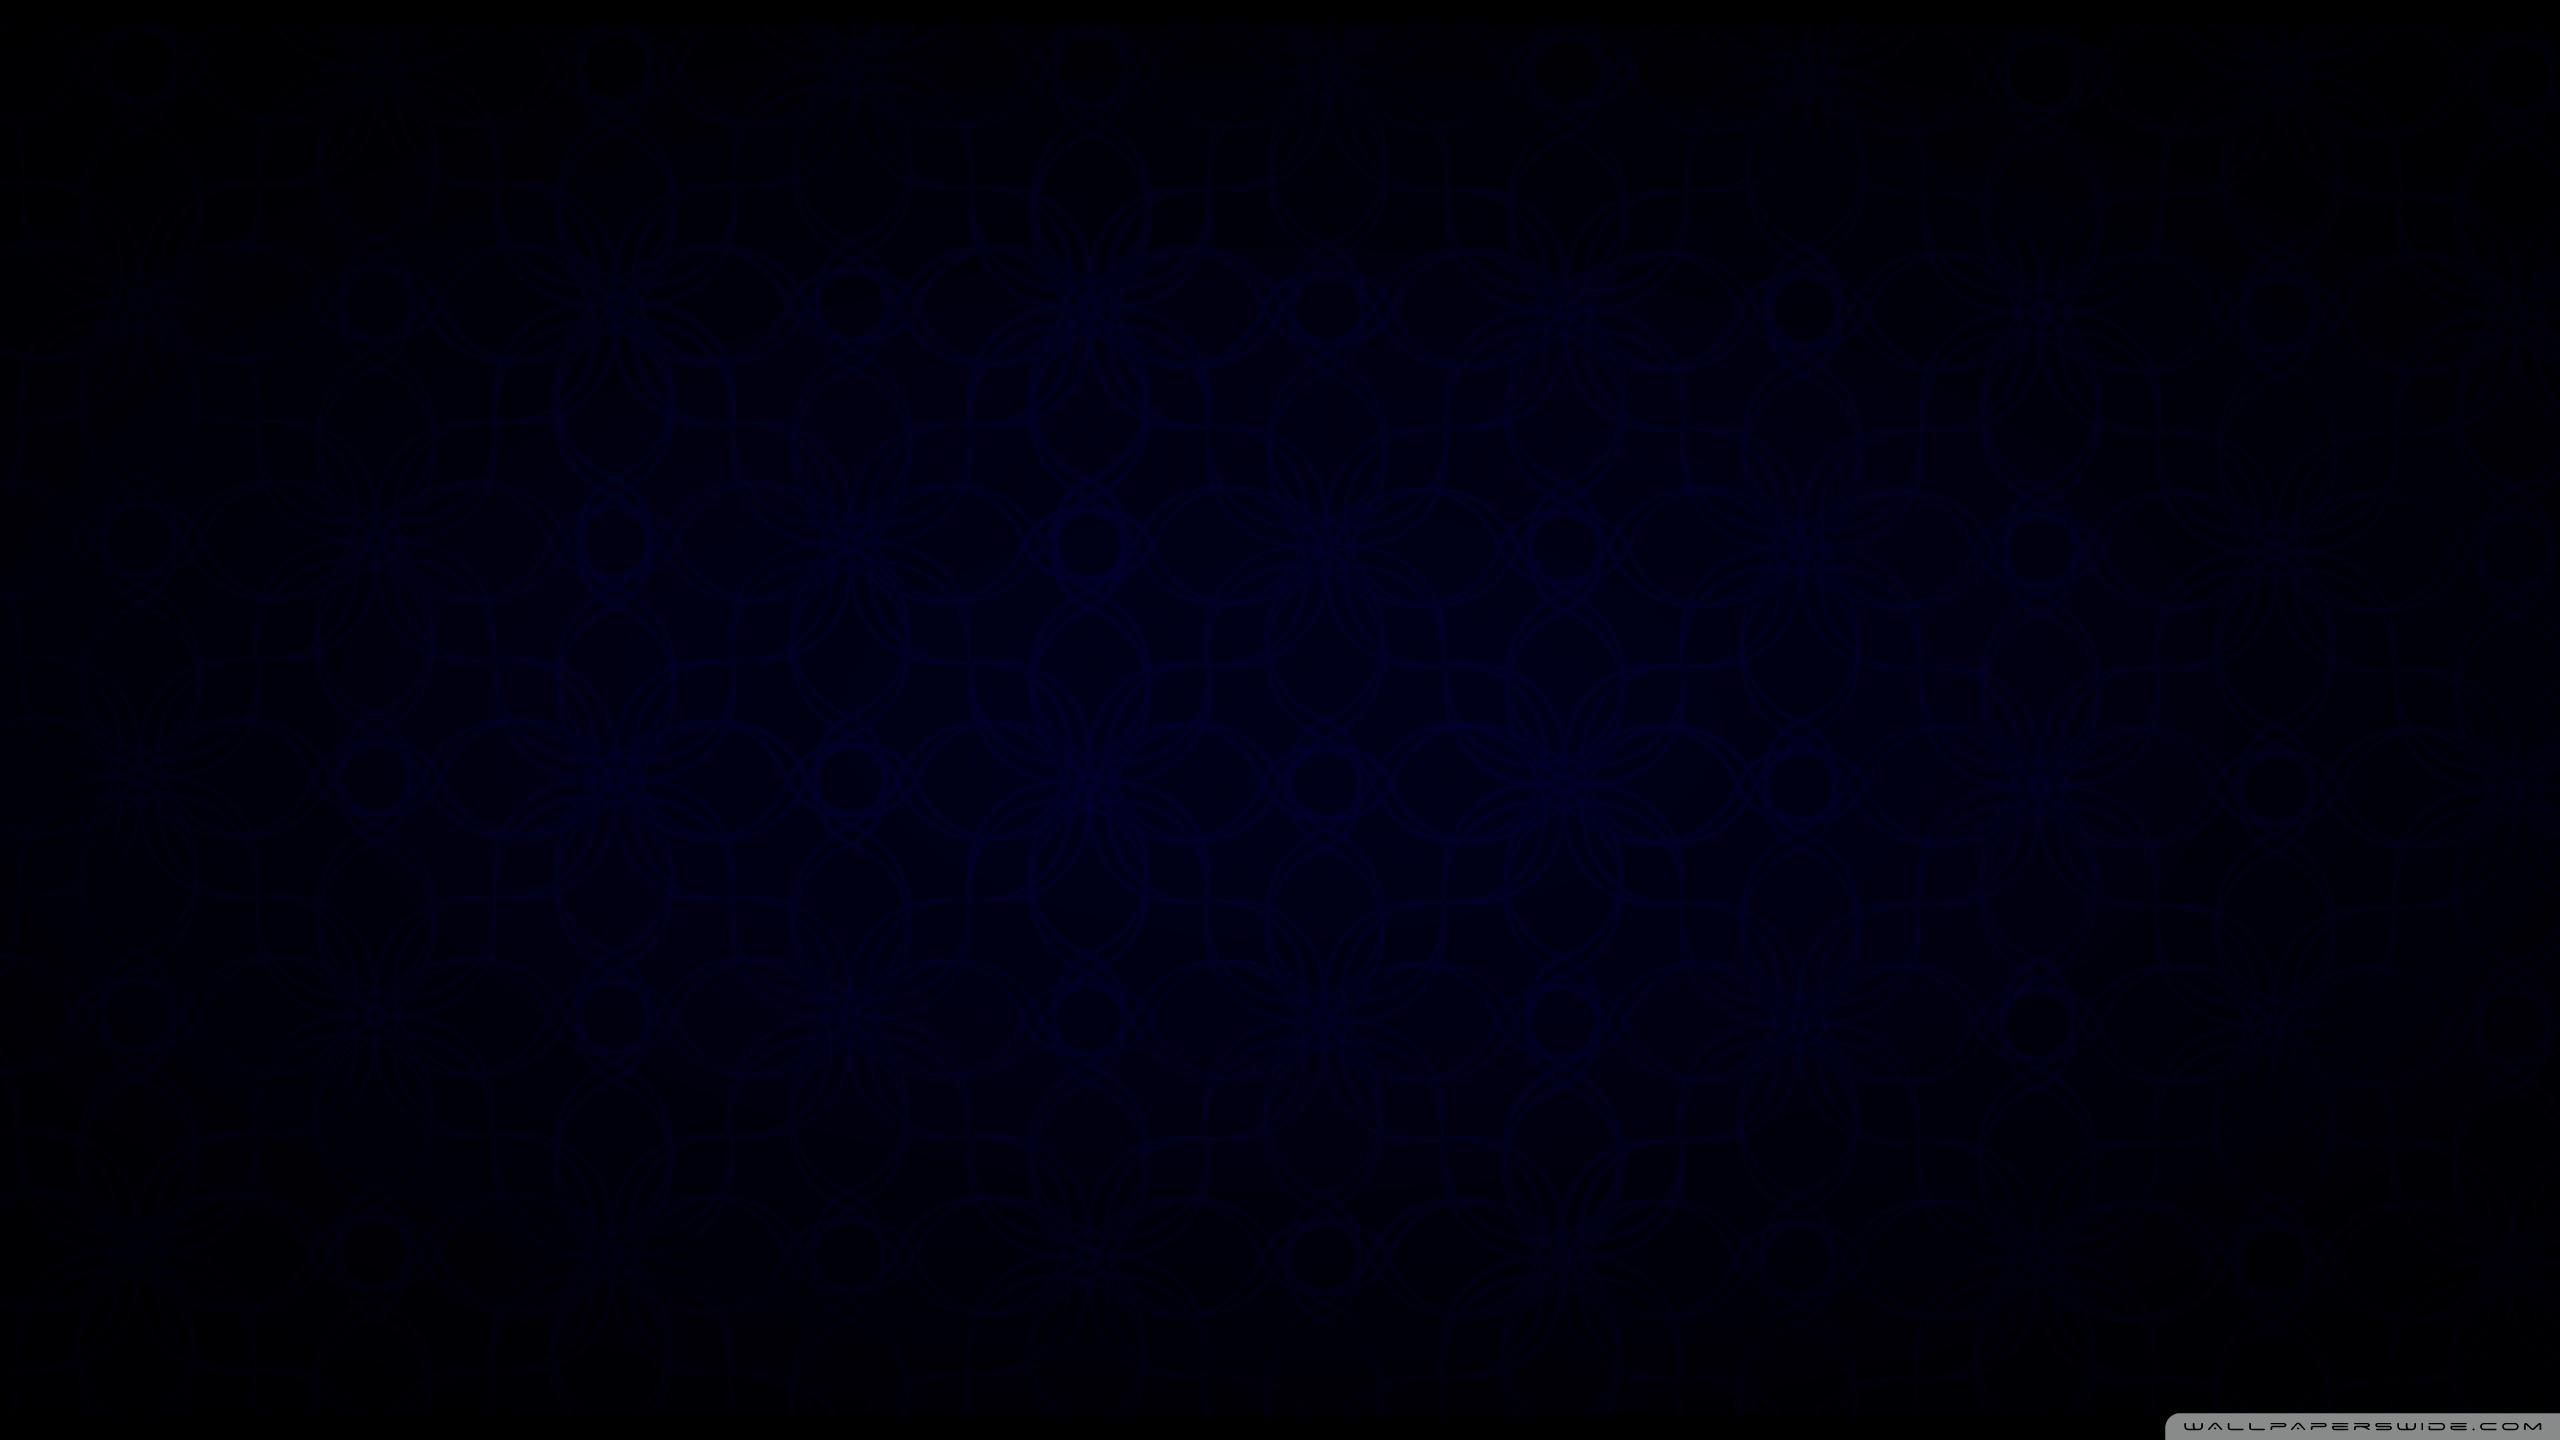 Dark Blue Vintage, Pattern, Black, HD Wallpaper And FREE .